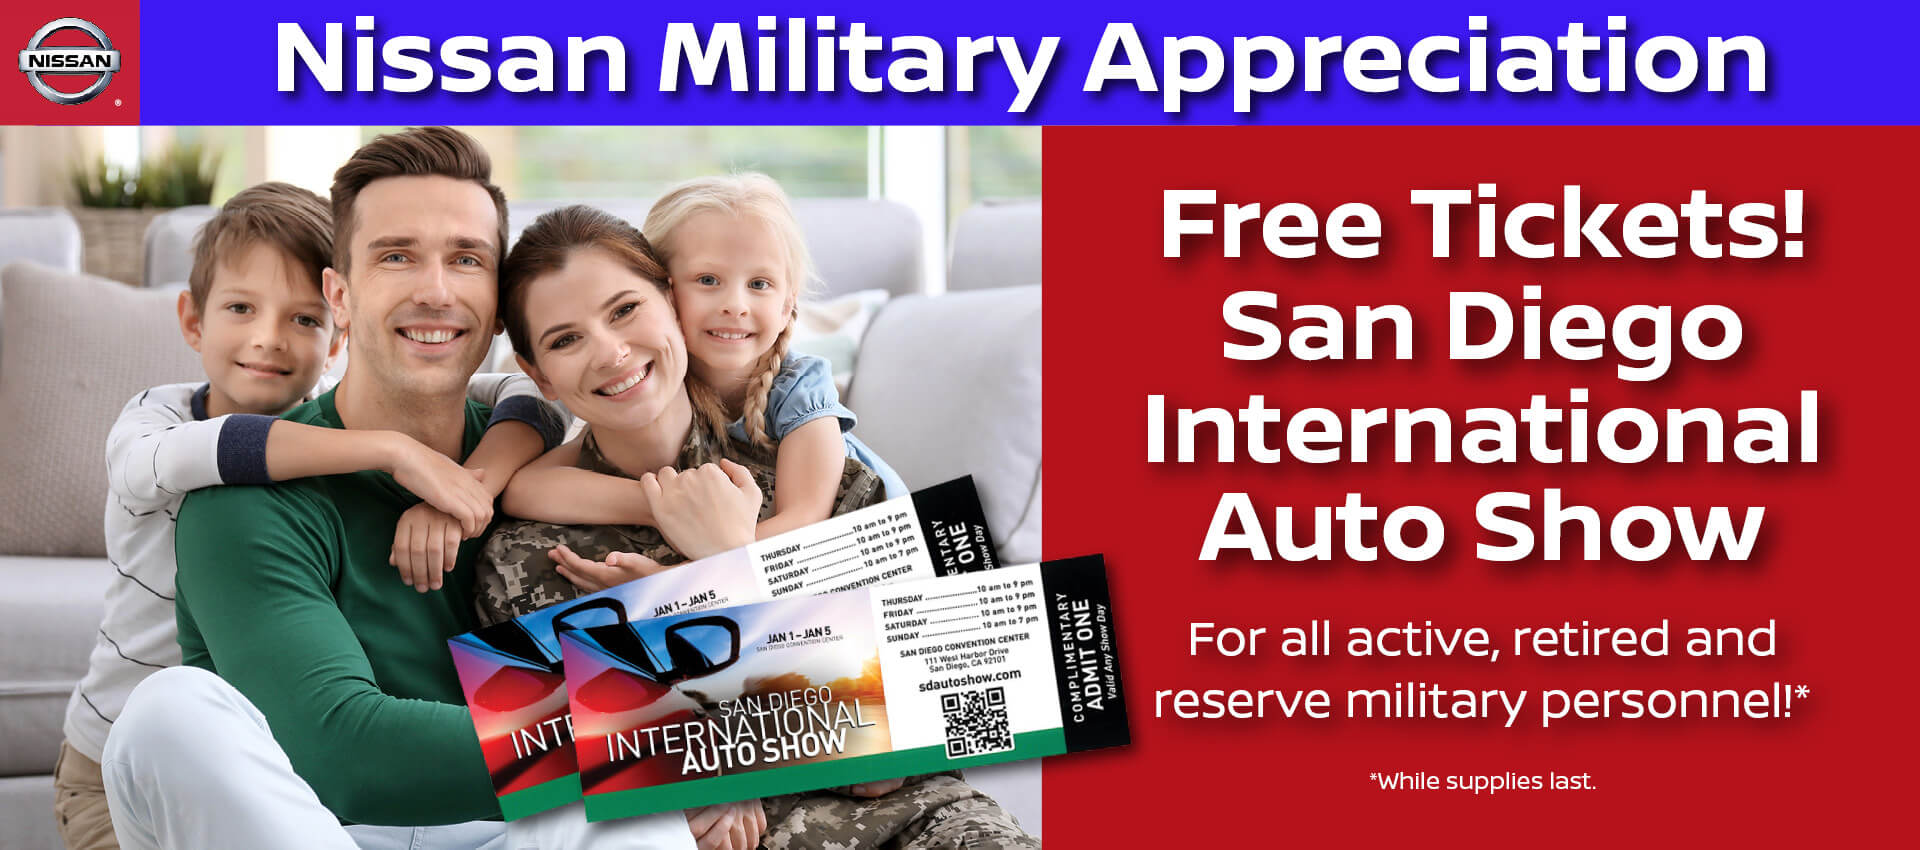 Nissan Military Appreciation